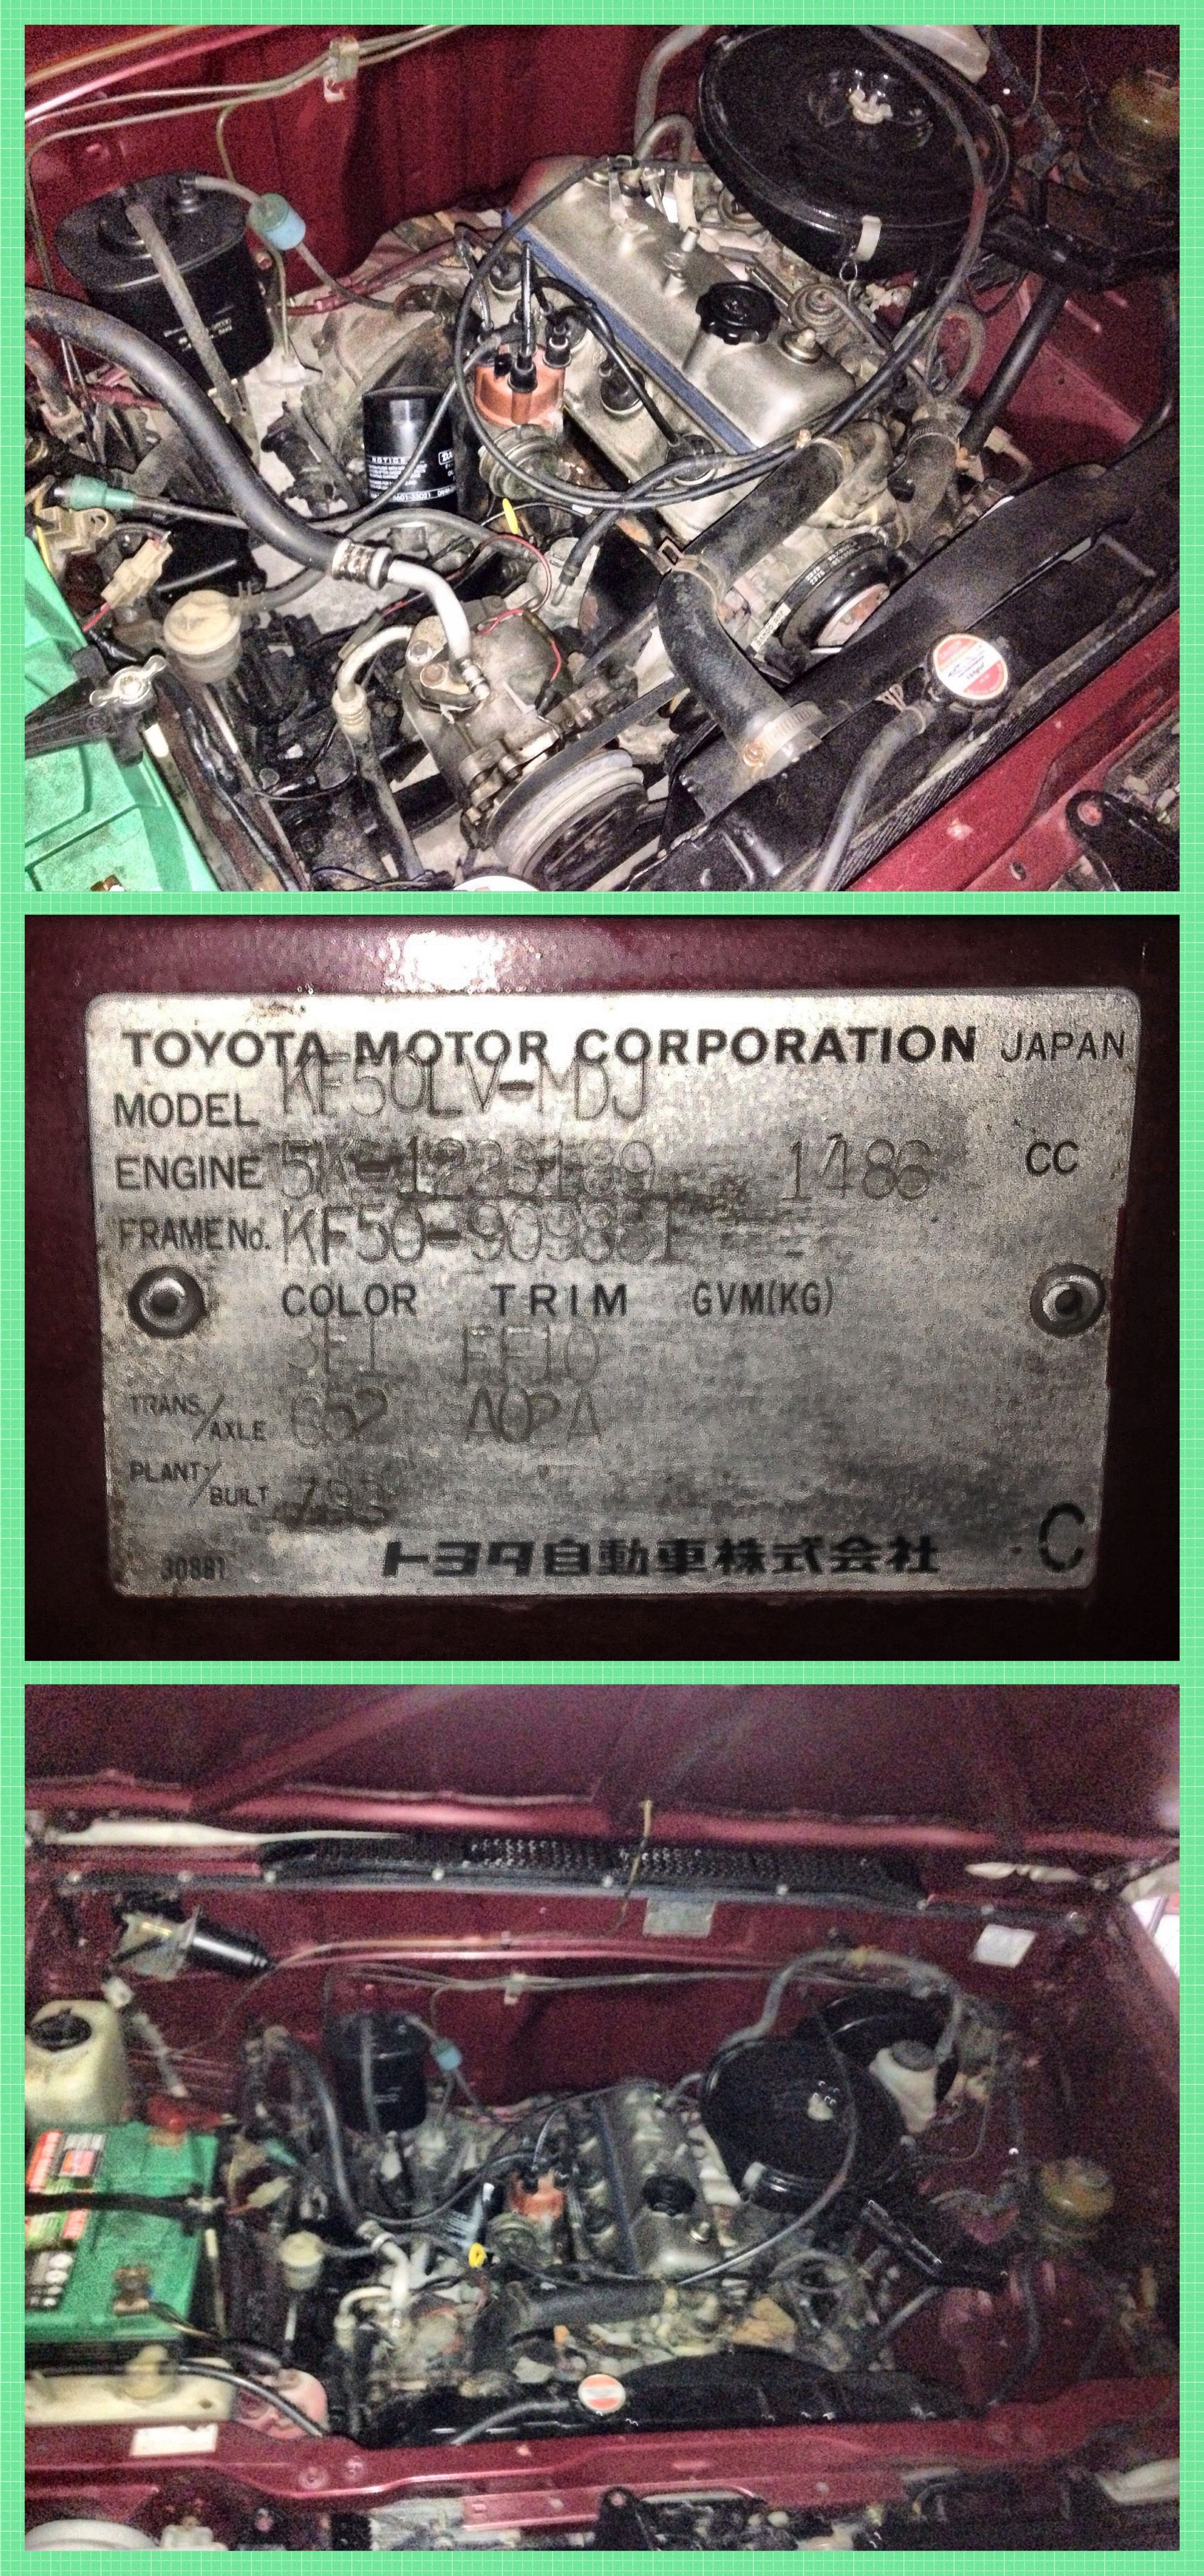 hight resolution of 1995 toyota tamaraw fx with a 5k gasoline engine